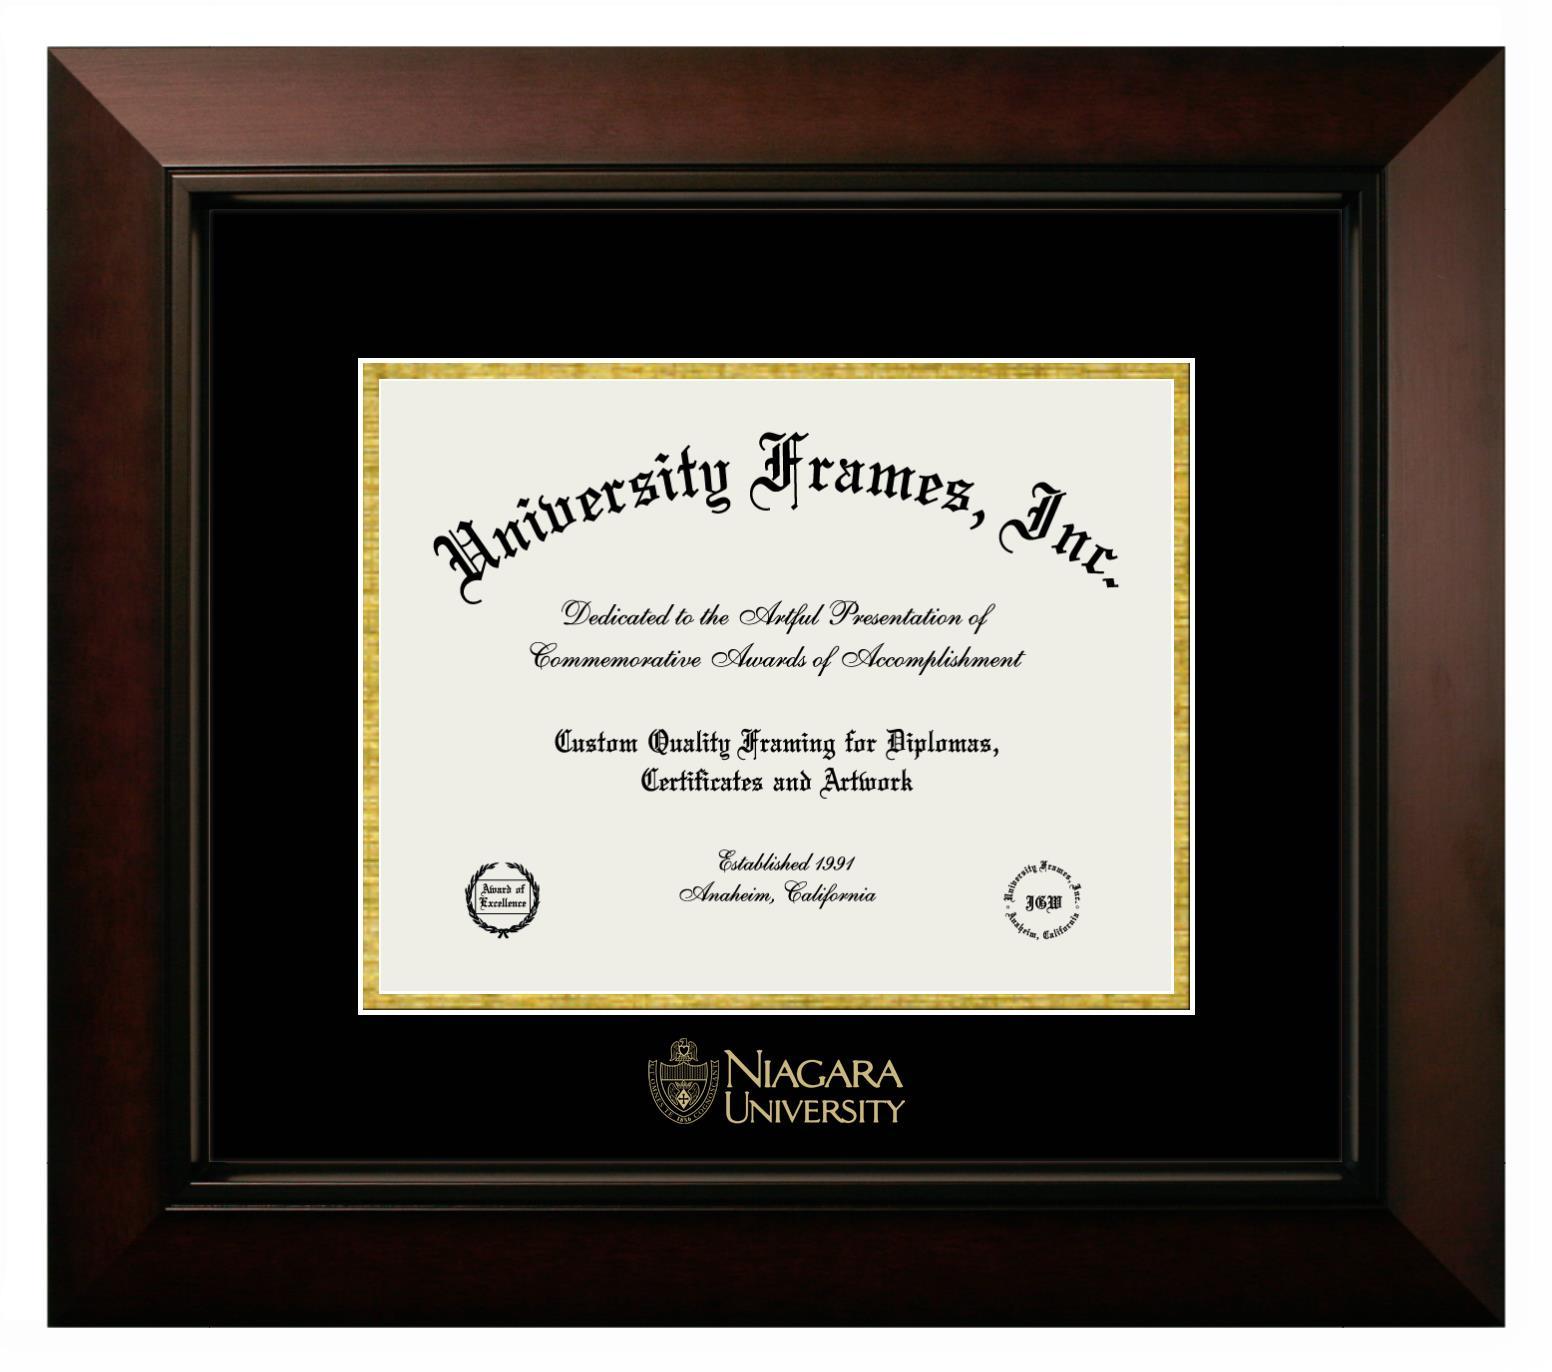 Niagara University Diploma Frame In Legacy Black Cherry With Black Gold Mats